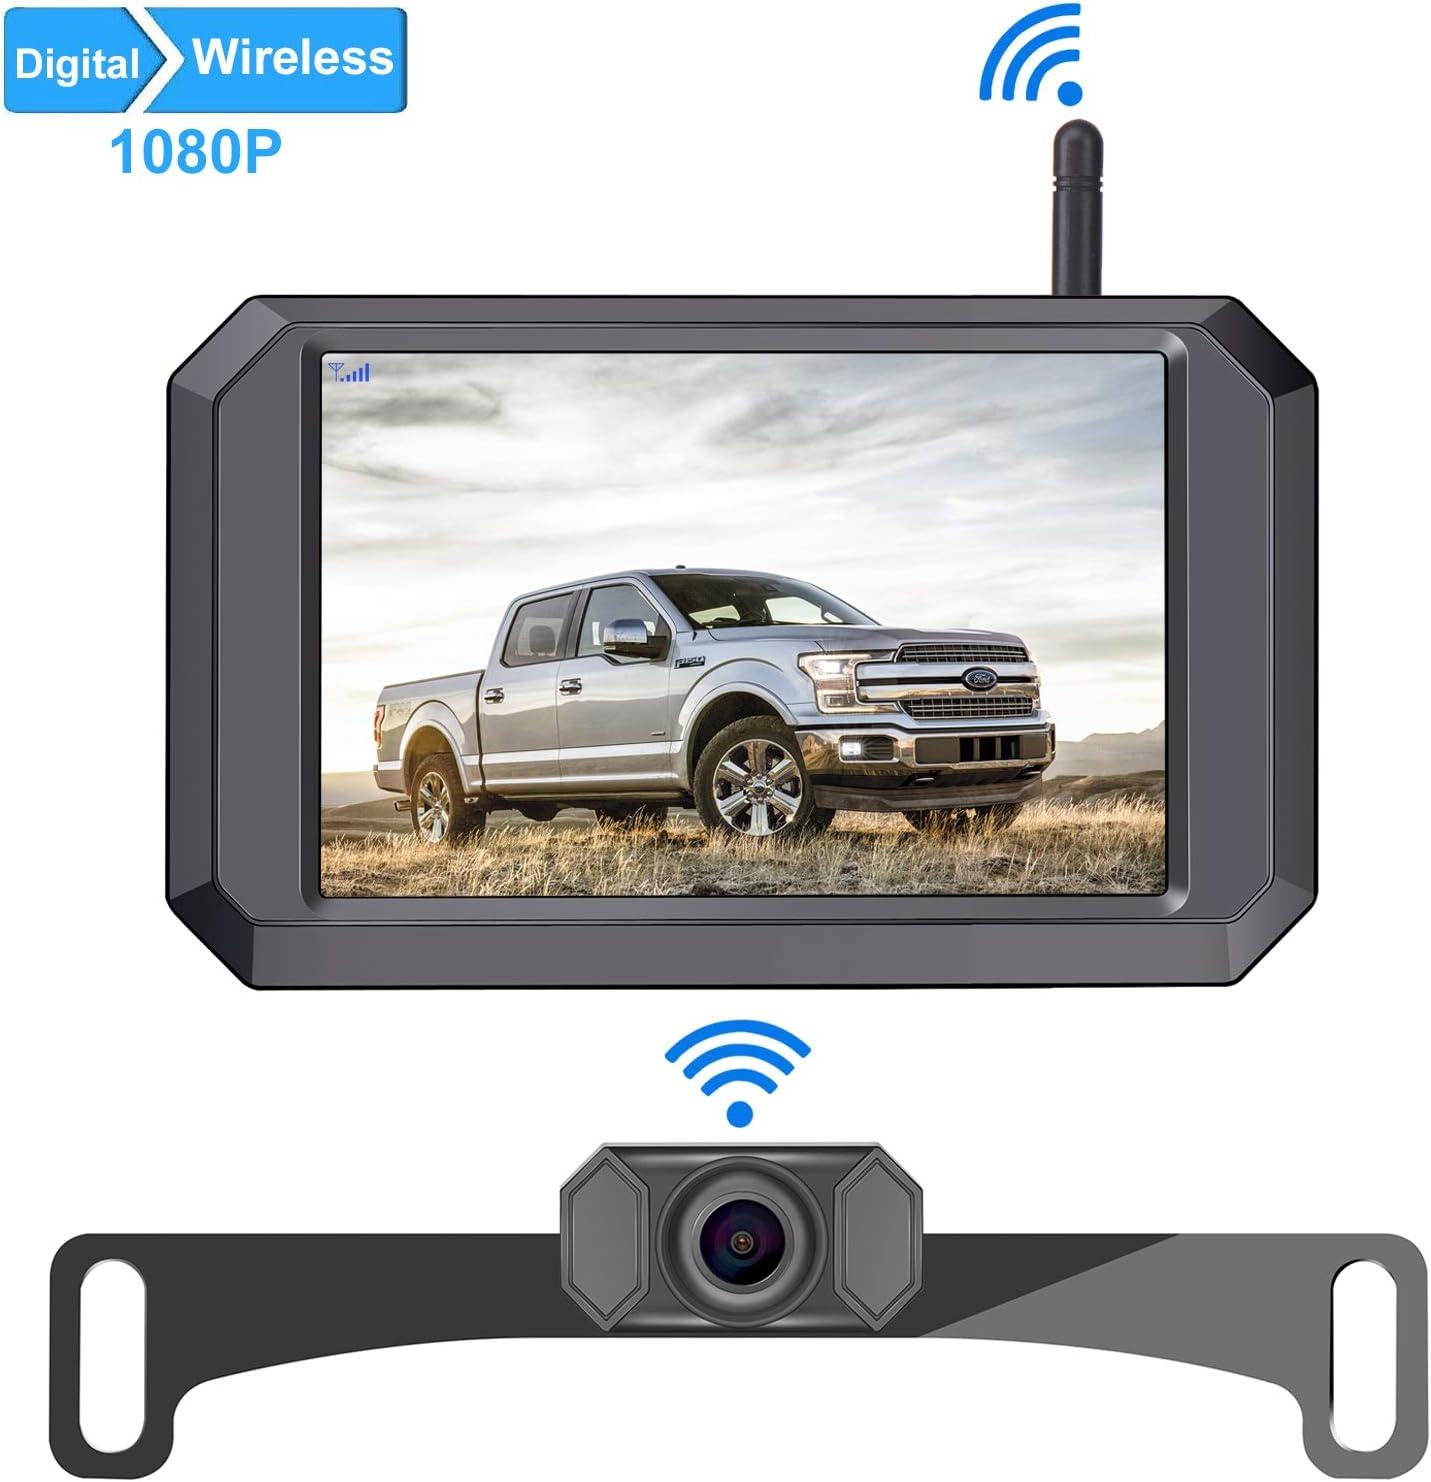 LeeKooLuu F09 HD 1080P Digital Wireless Backup Camera 5'' Display License Plate Hitch Rear View Camera for Trucks